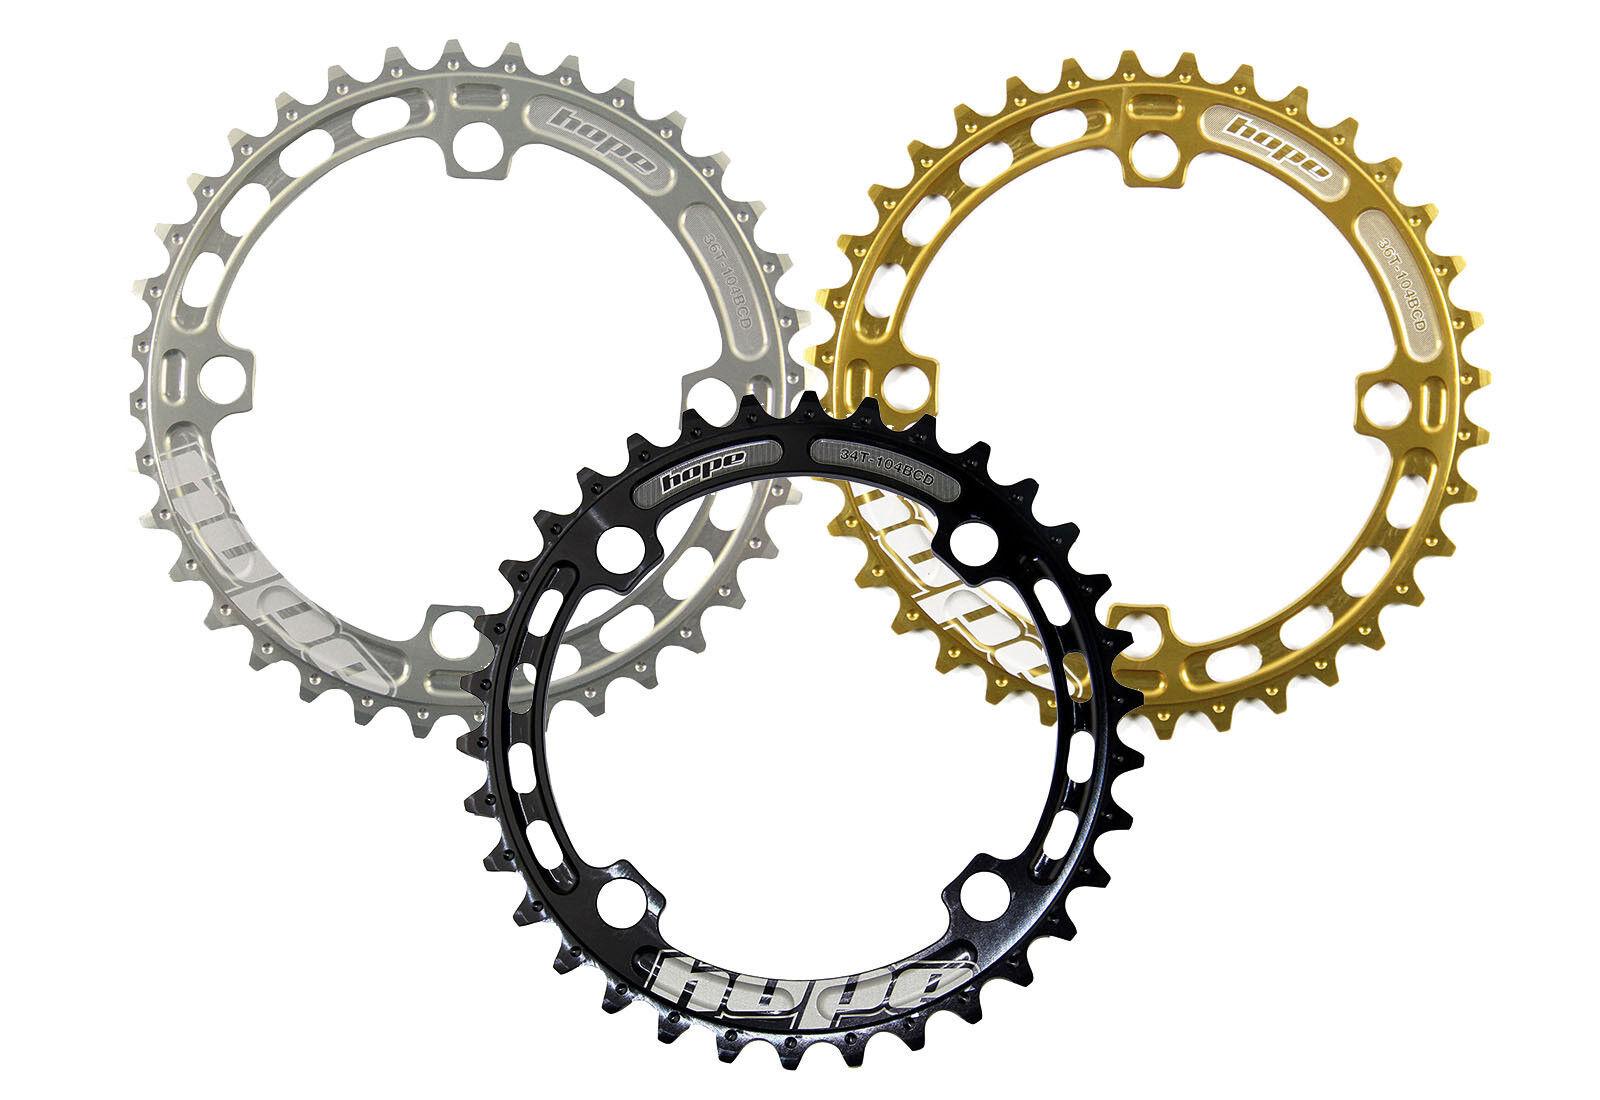 Hope Downhill DH MTB Mountain Bike Single Chainring Chain Ring 32 34 36 38 40 T